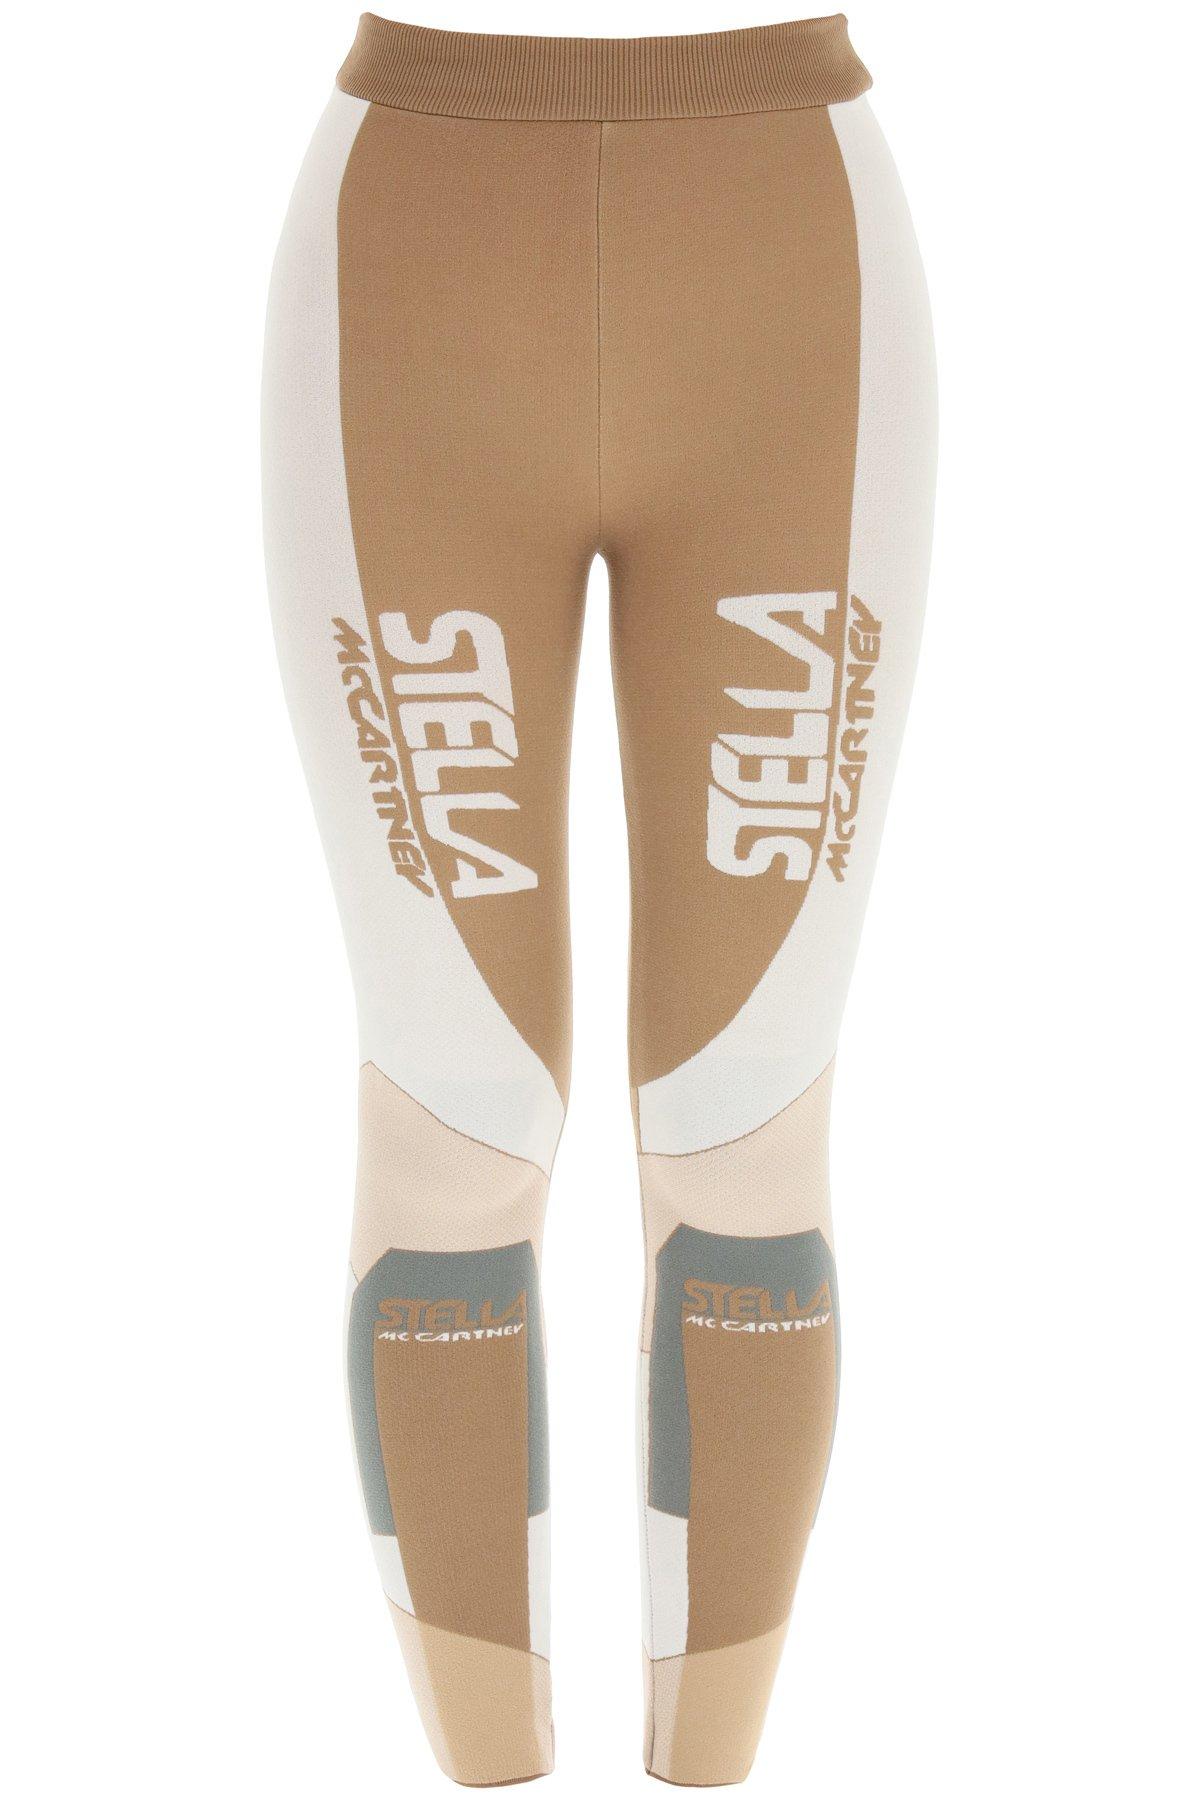 Stella mccartney leggings sporty logo